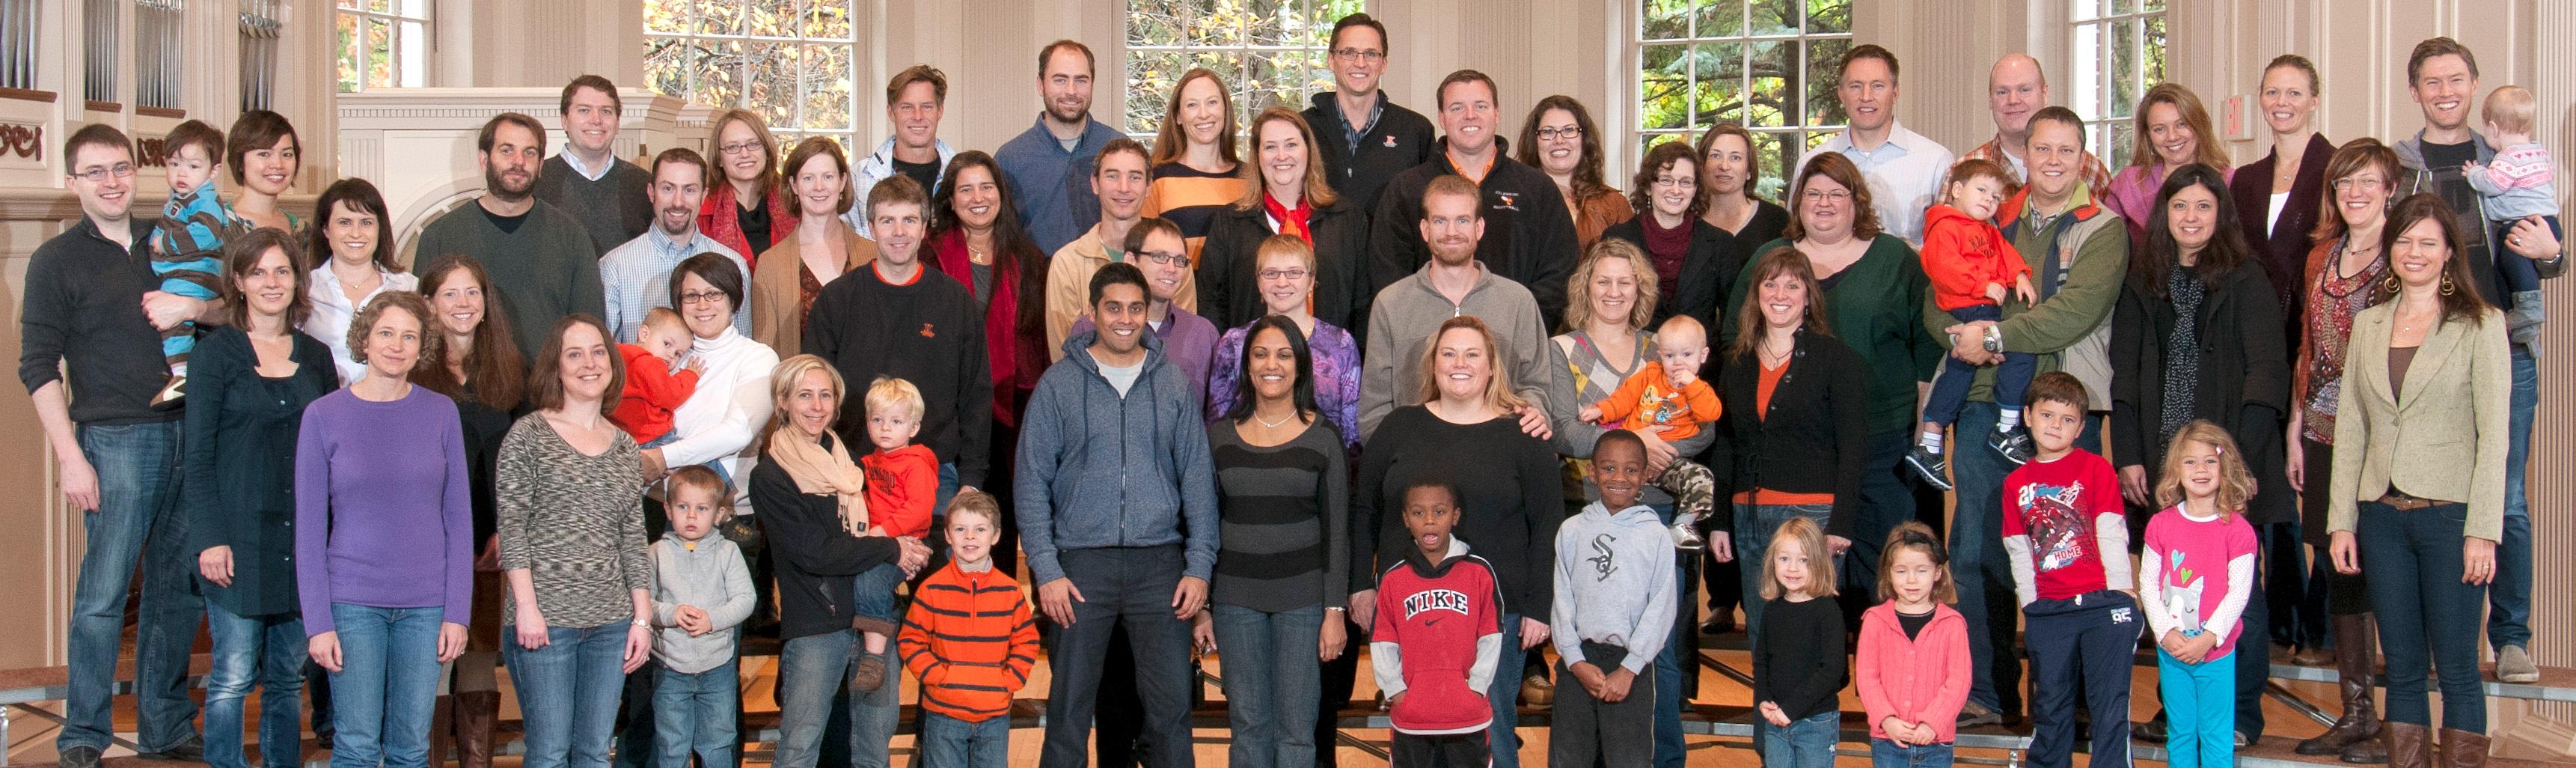 Class of 1997 - Alumni Engagement